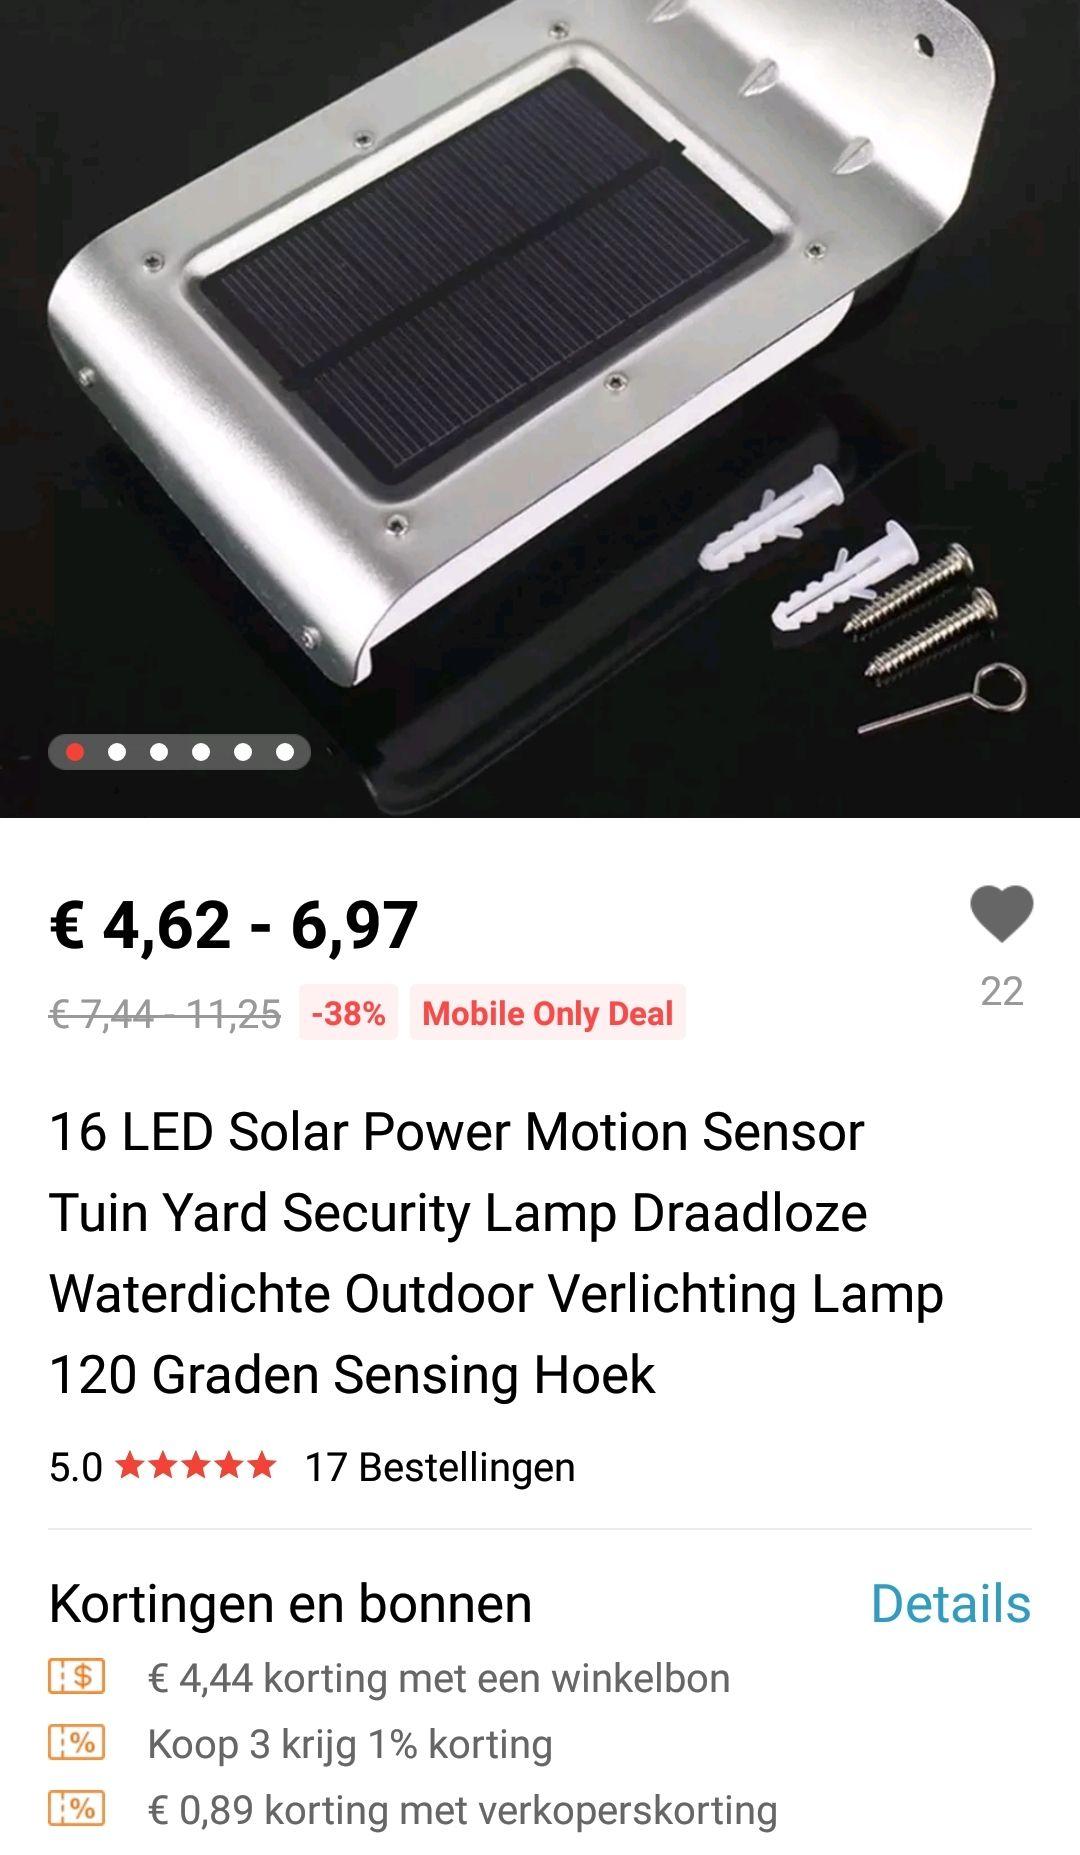 Ali-express mobile deal: Eco buitenlamp 16led met sensor op zonne-energie